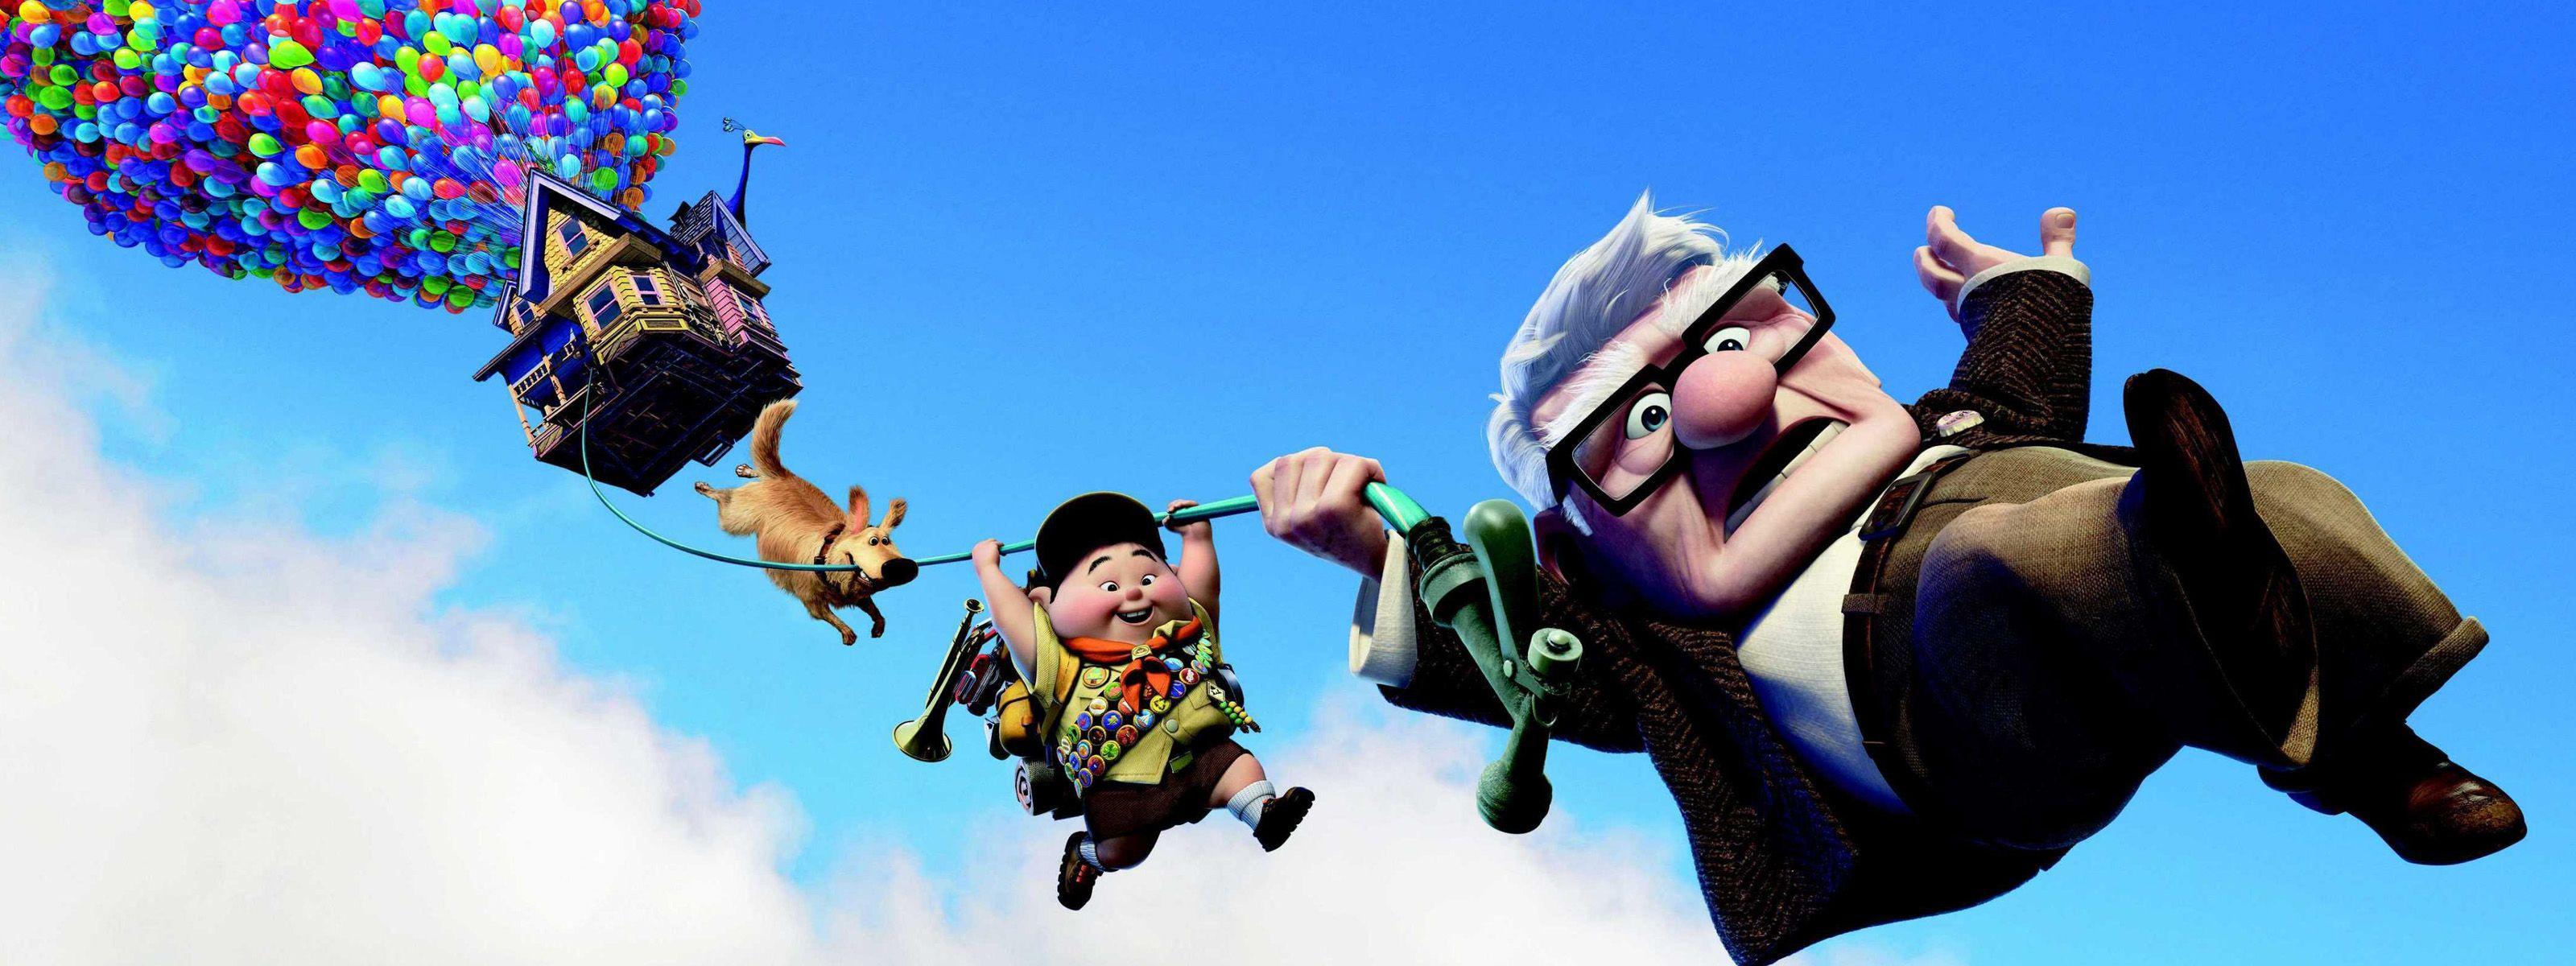 Hd Wallpapers Widescreen 1080p 3d Movie Wallpapers Hd Widescreen Latest Movie Wallpapers In High Disney Pixar Up Disney Desktop Wallpaper Cover Pics